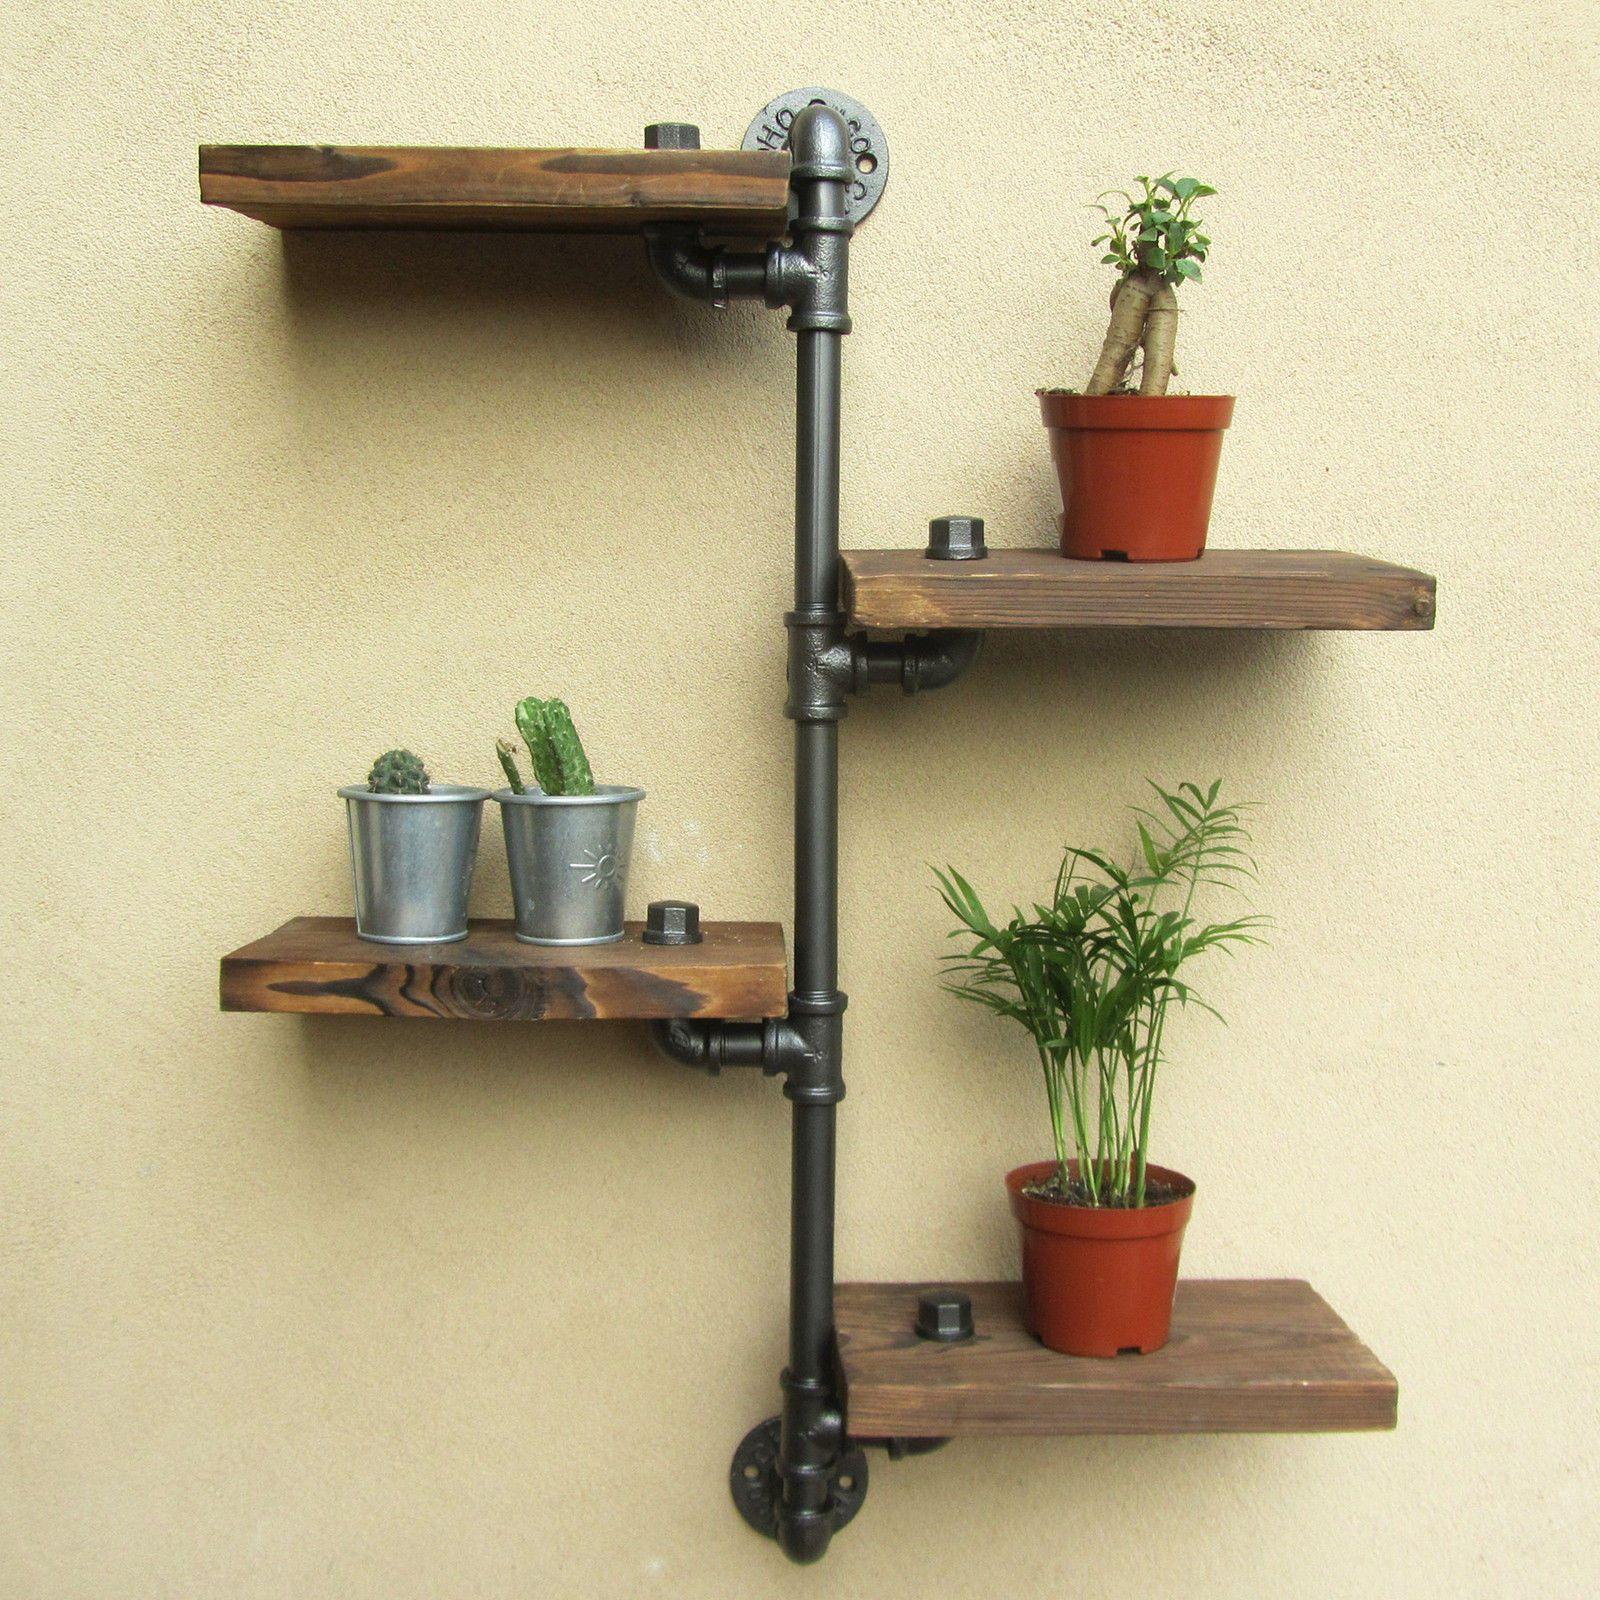 Urban industrial rustic wall mount iron pipe 4 tiers wood shelf ...